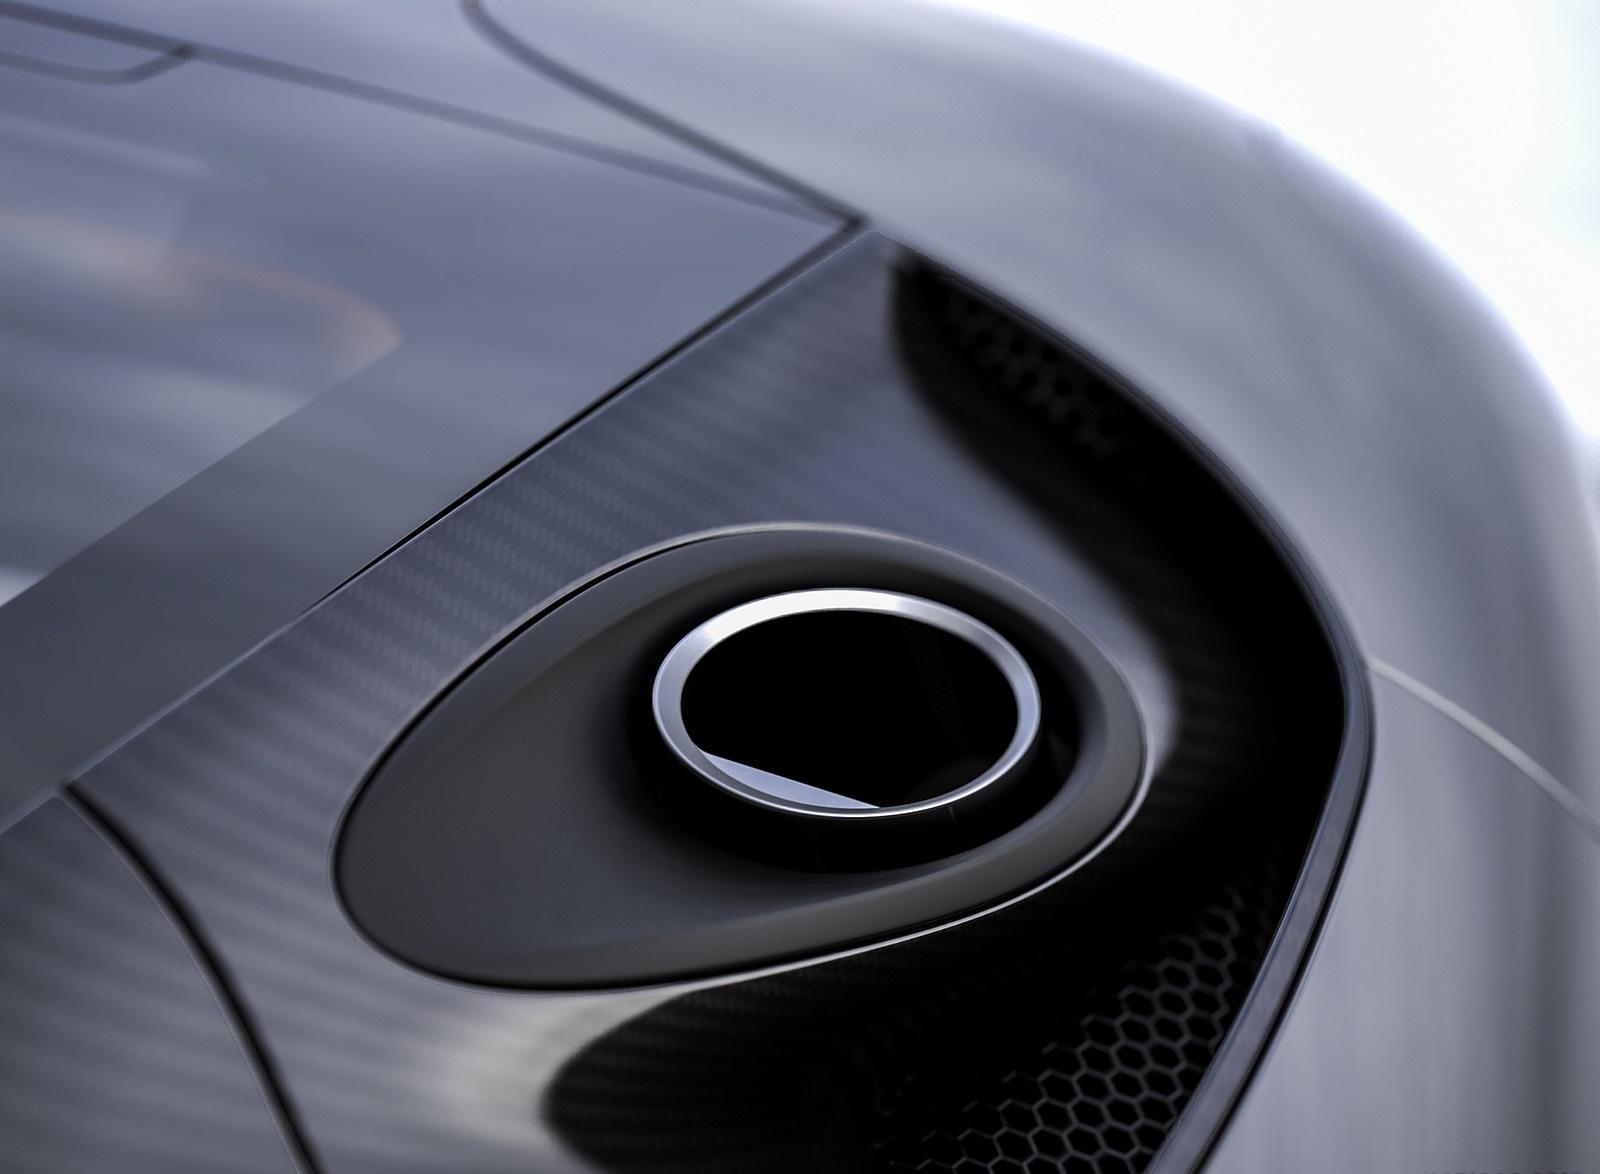 2021 Koenigsegg Gemera Exhaust Wallpapers #39 of 45